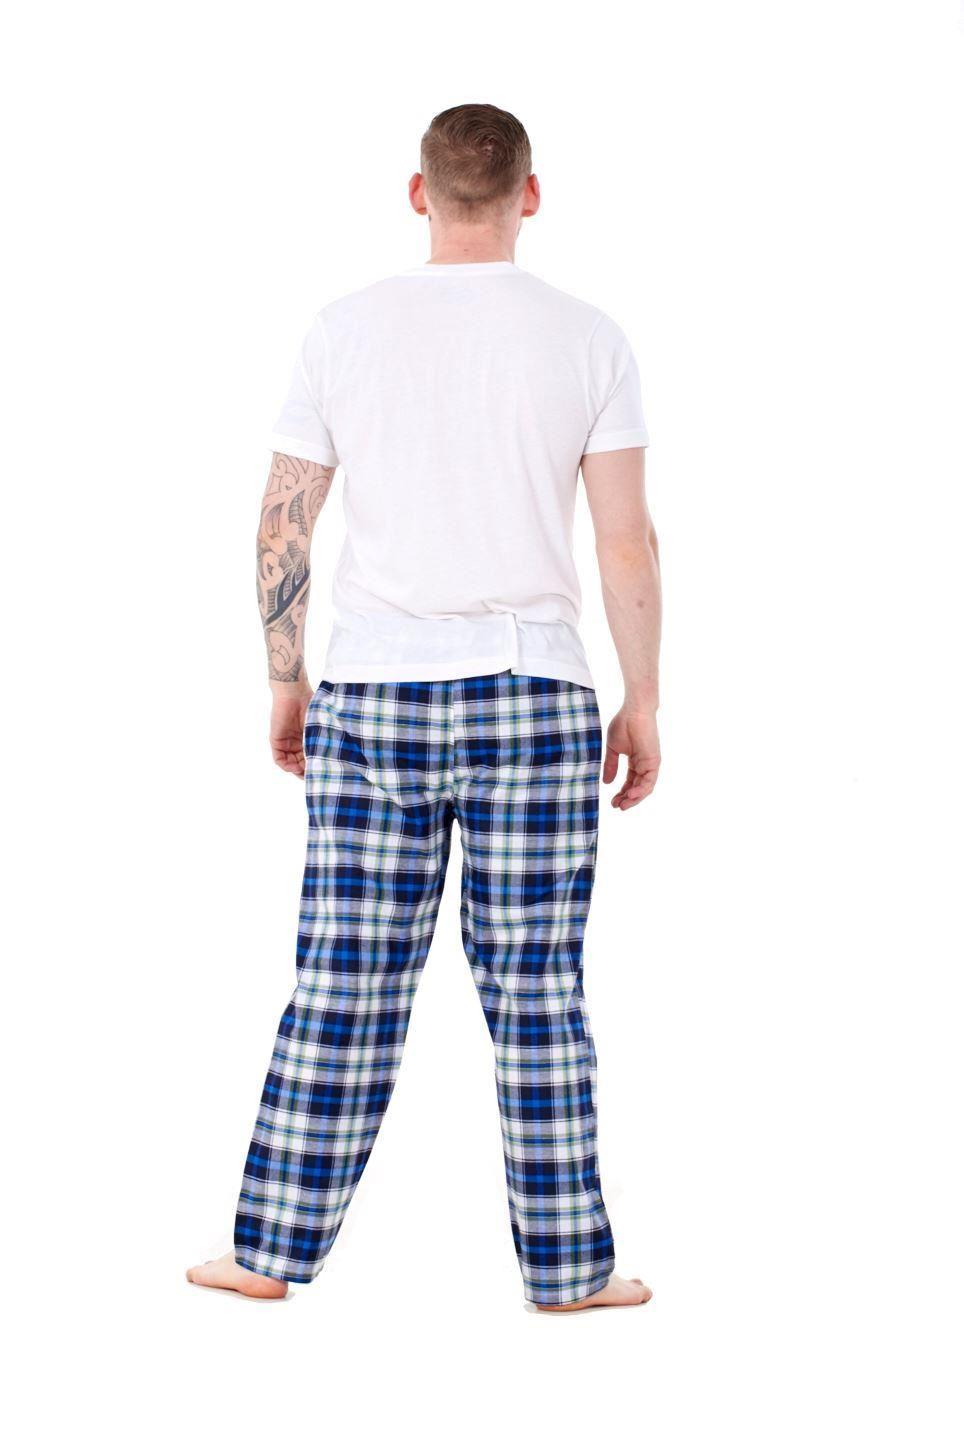 Mens-Pyjama-Bottoms-Rich-Cotton-Woven-Check-Lounge-Pant-Nightwear-Big-3XL-to-5XL Indexbild 45